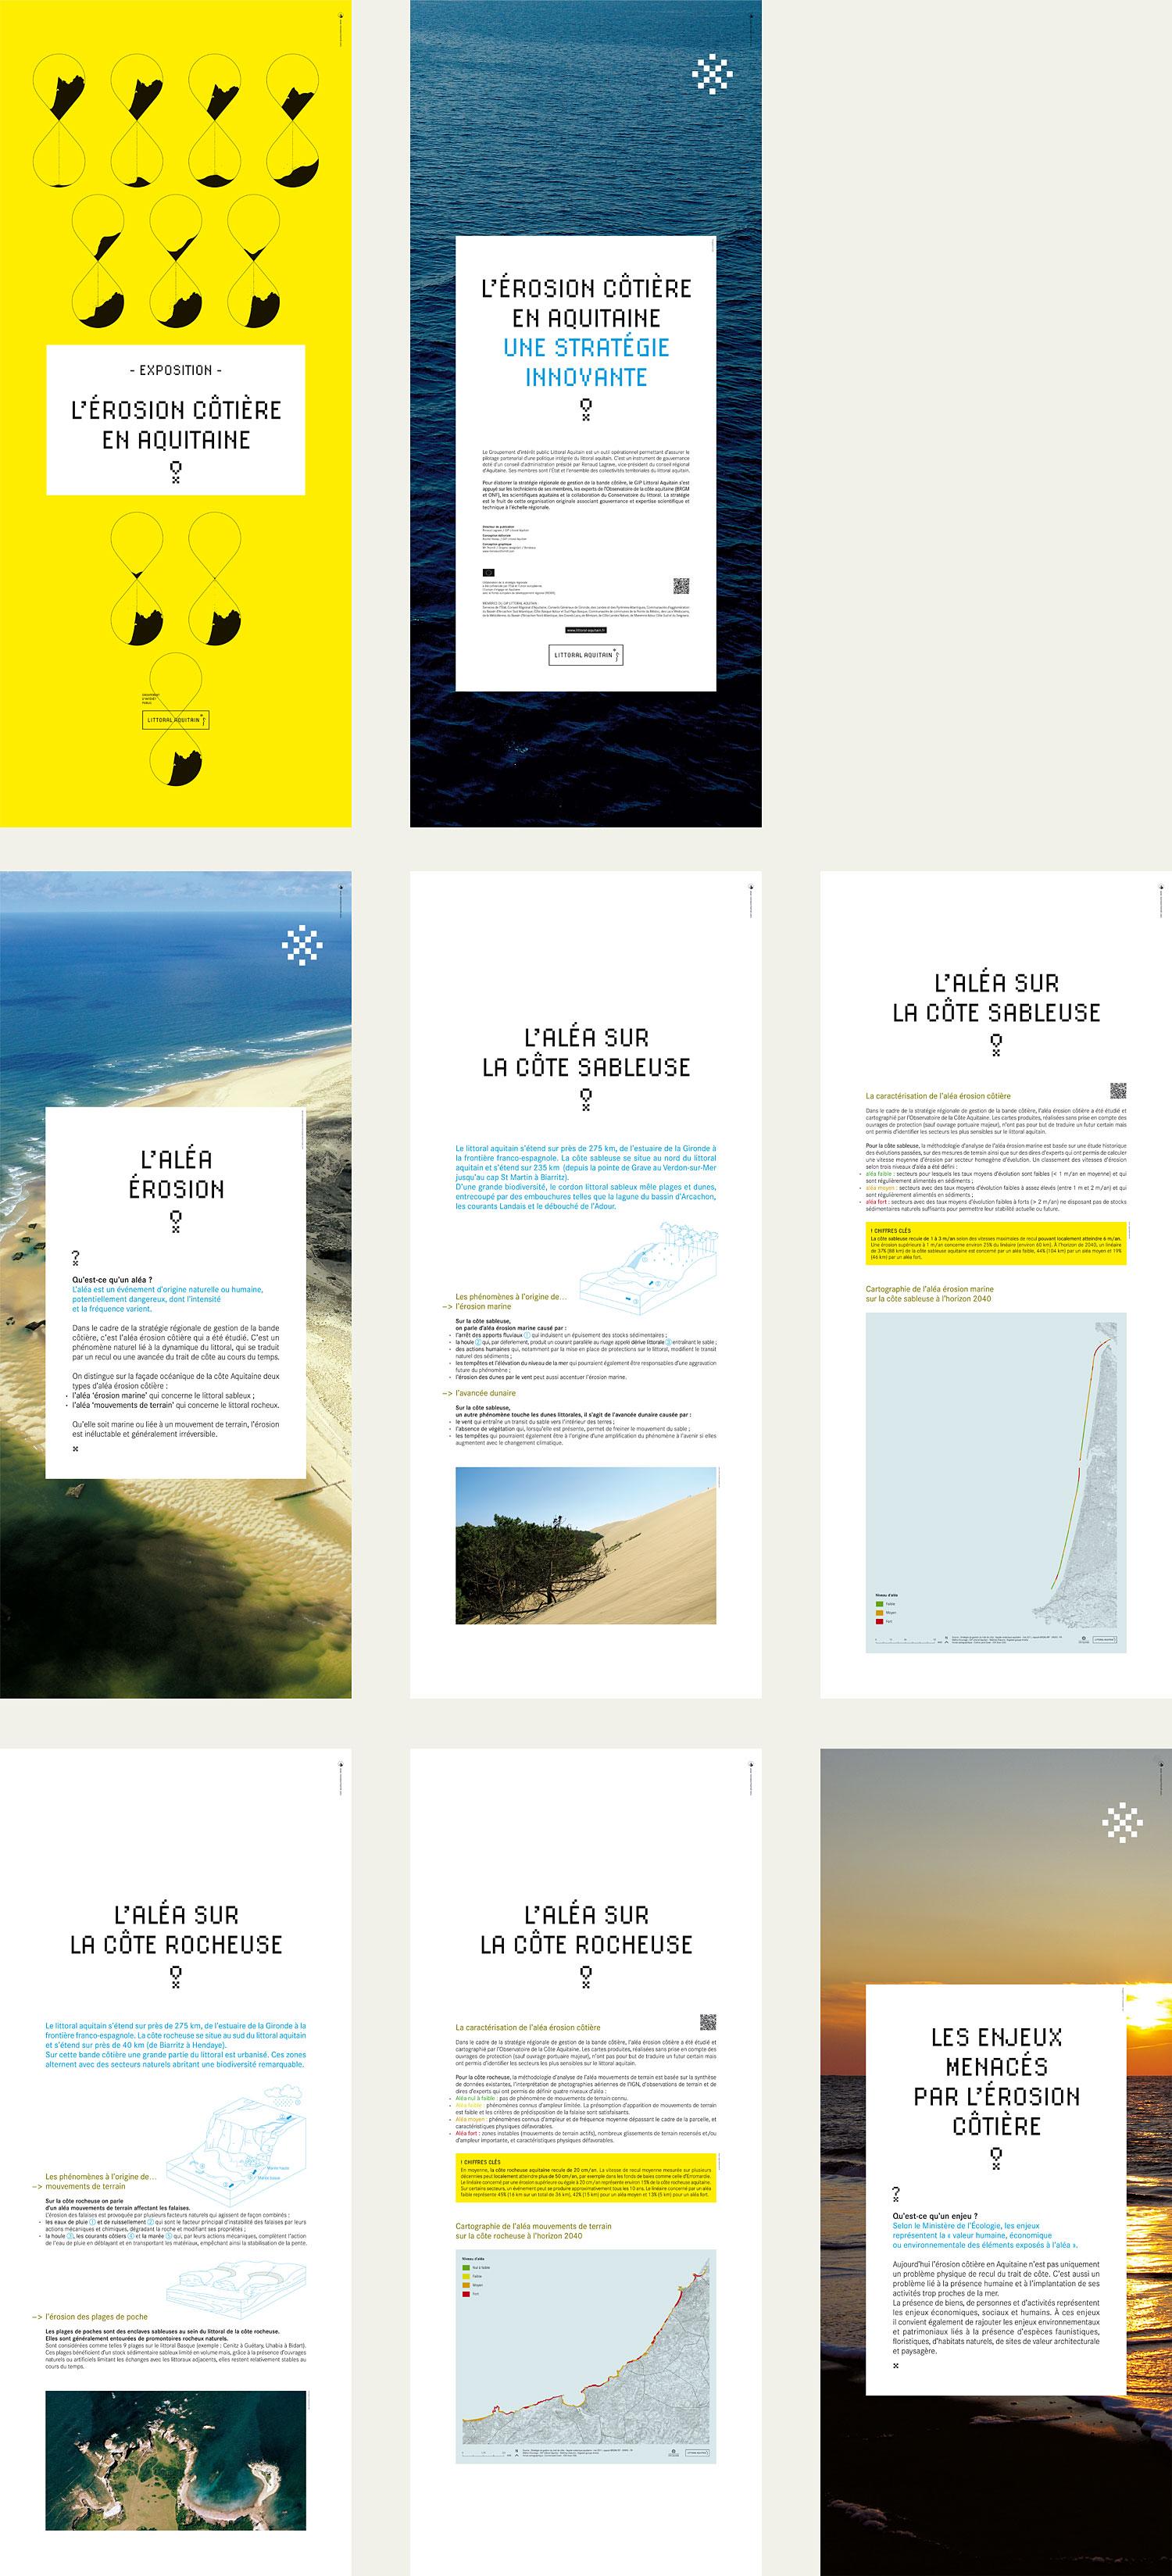 MrThornill-design-littoral-aquitain-2013-f4